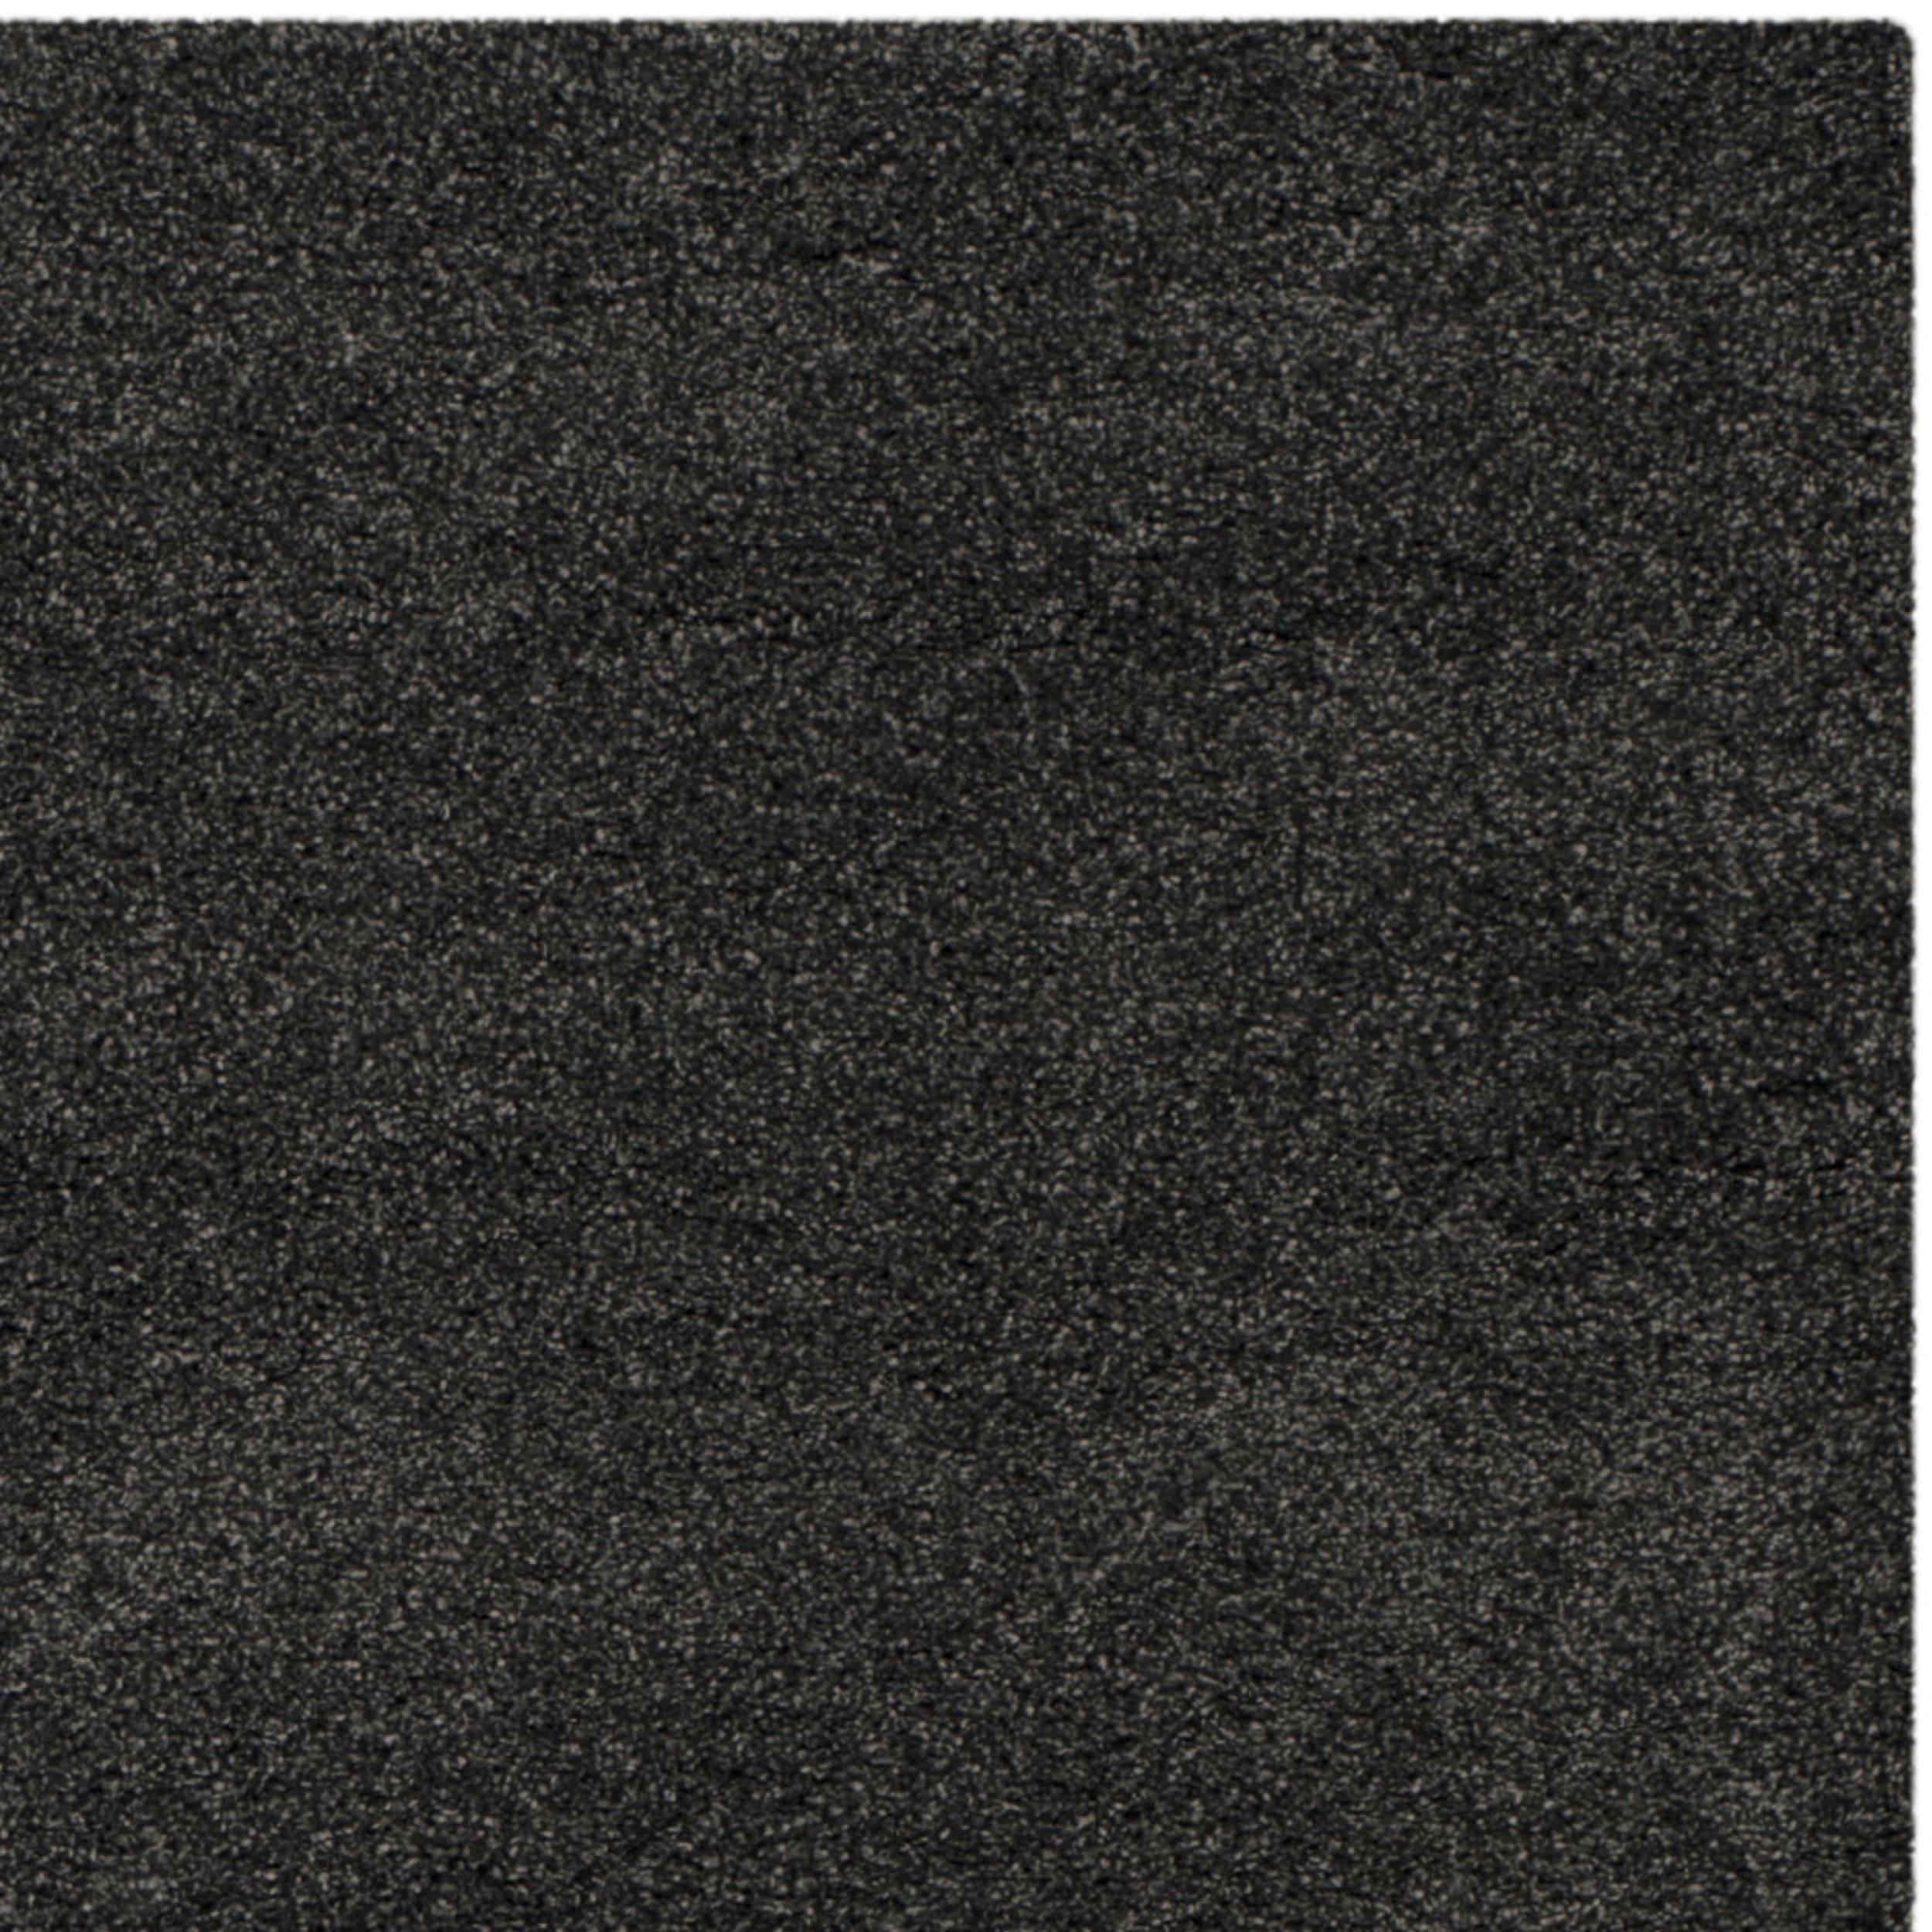 Safavieh Milan Dark Grey Rug 10 X 14 On Ships To Canada 9942362